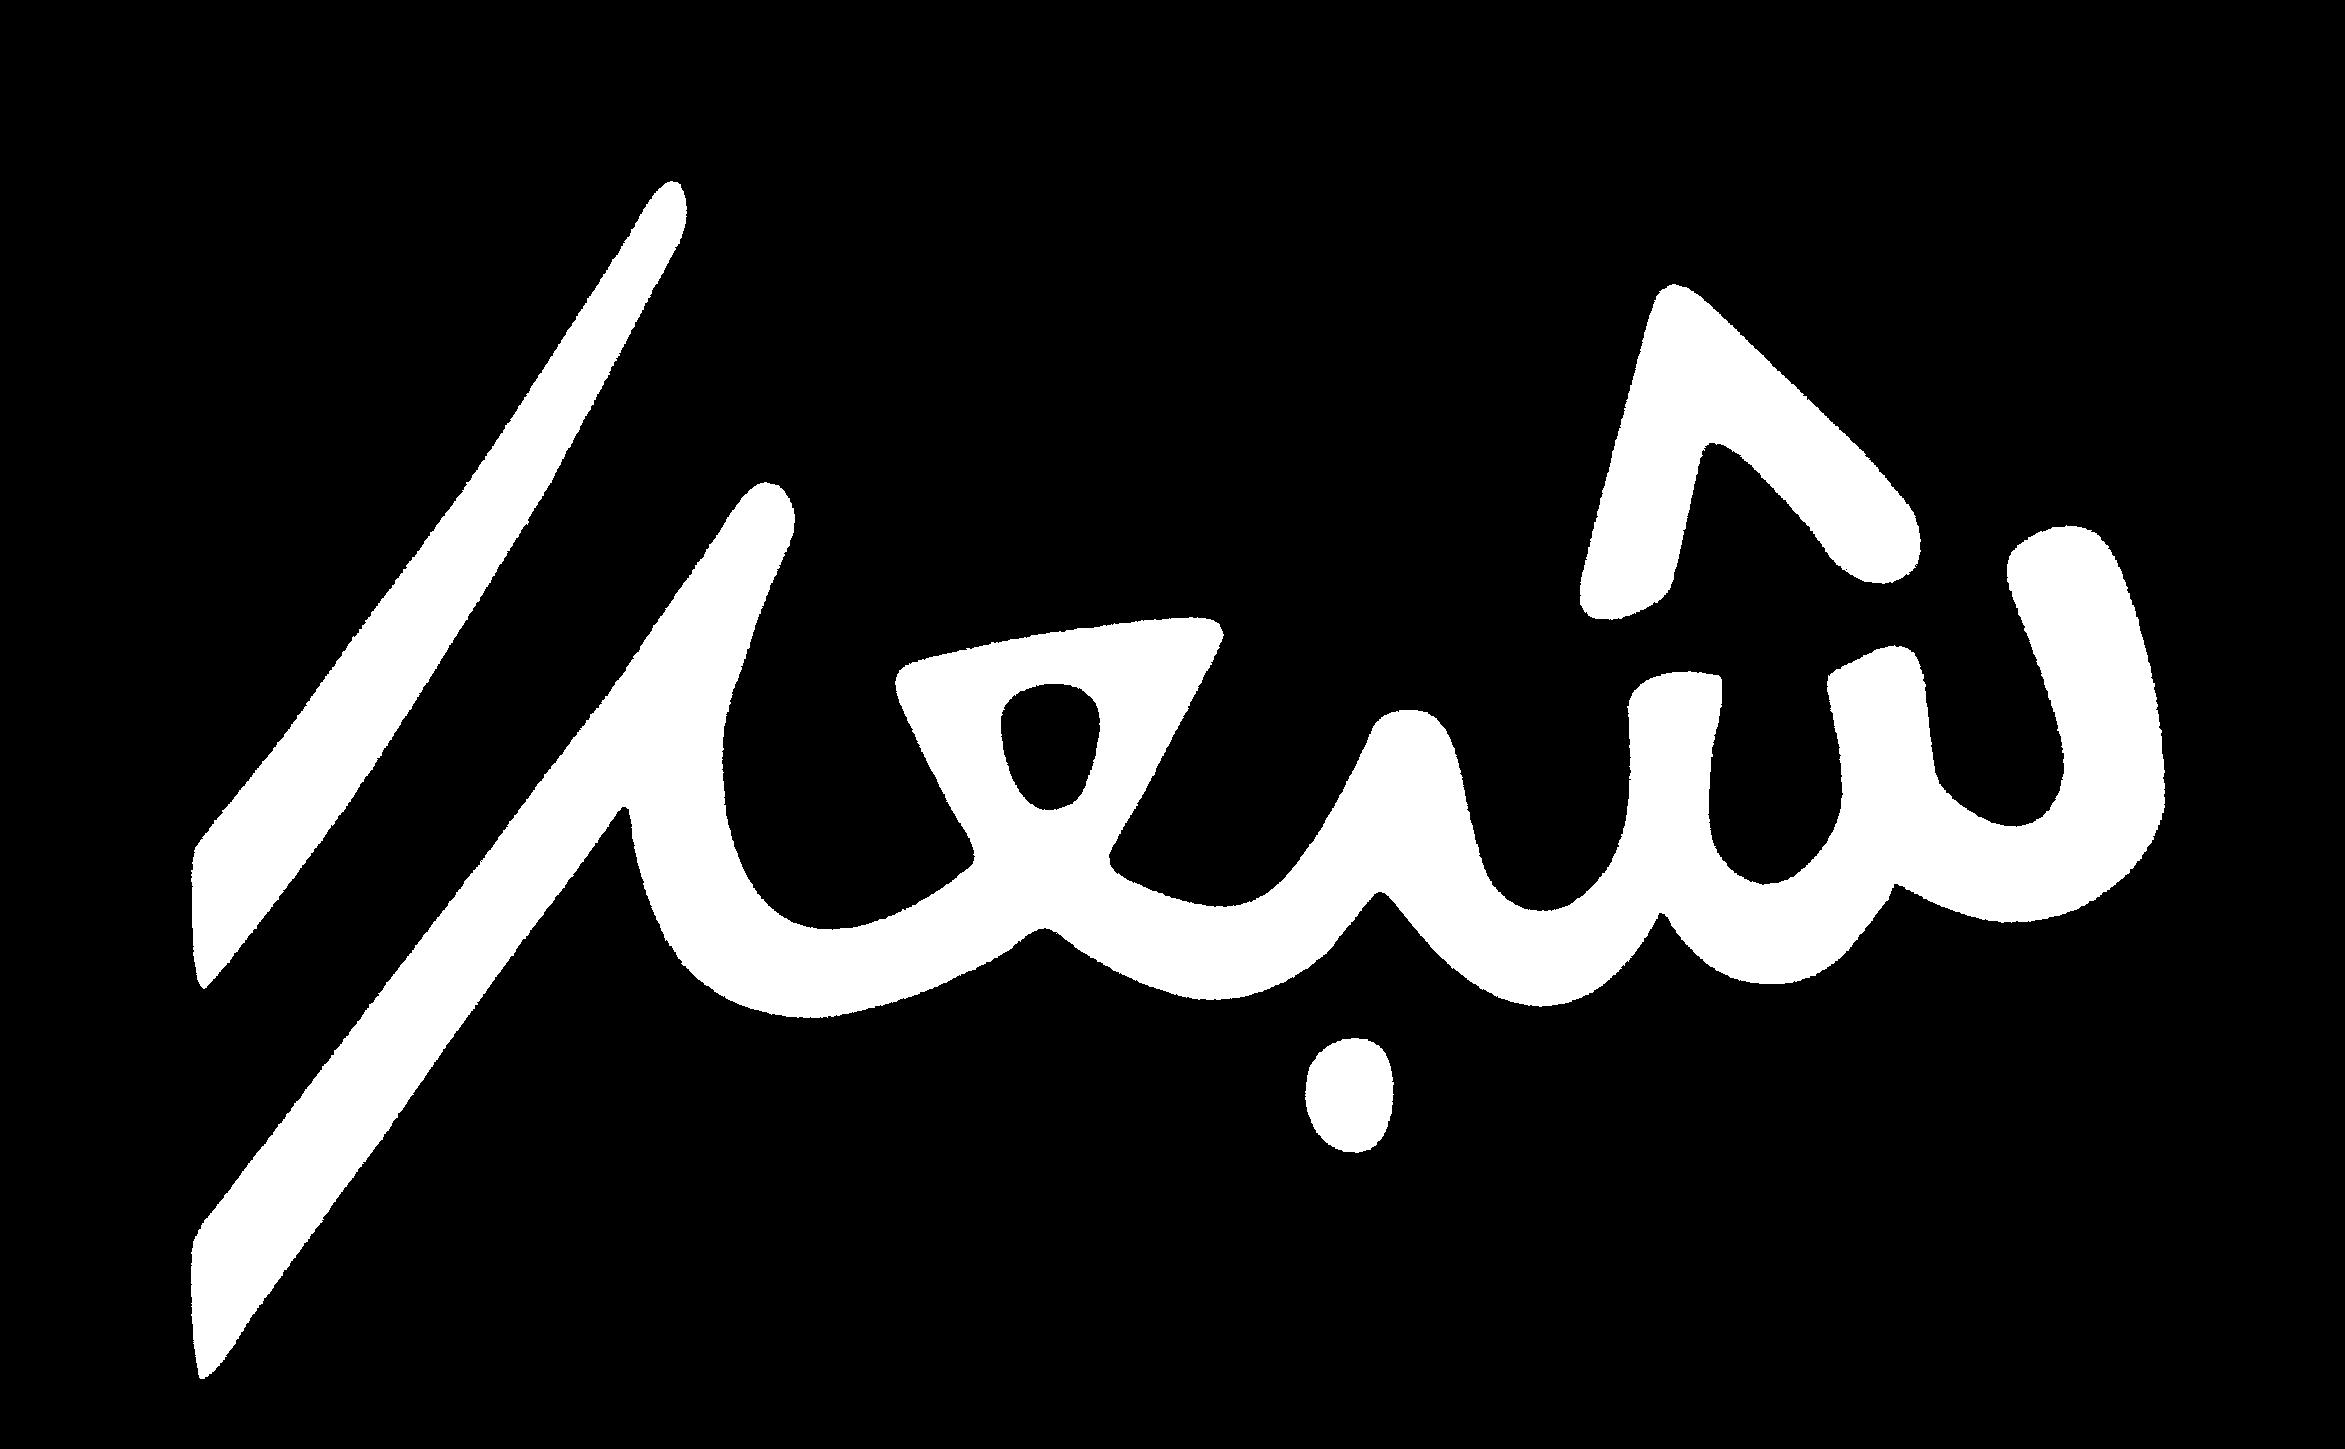 Logo Chabaa en arabe